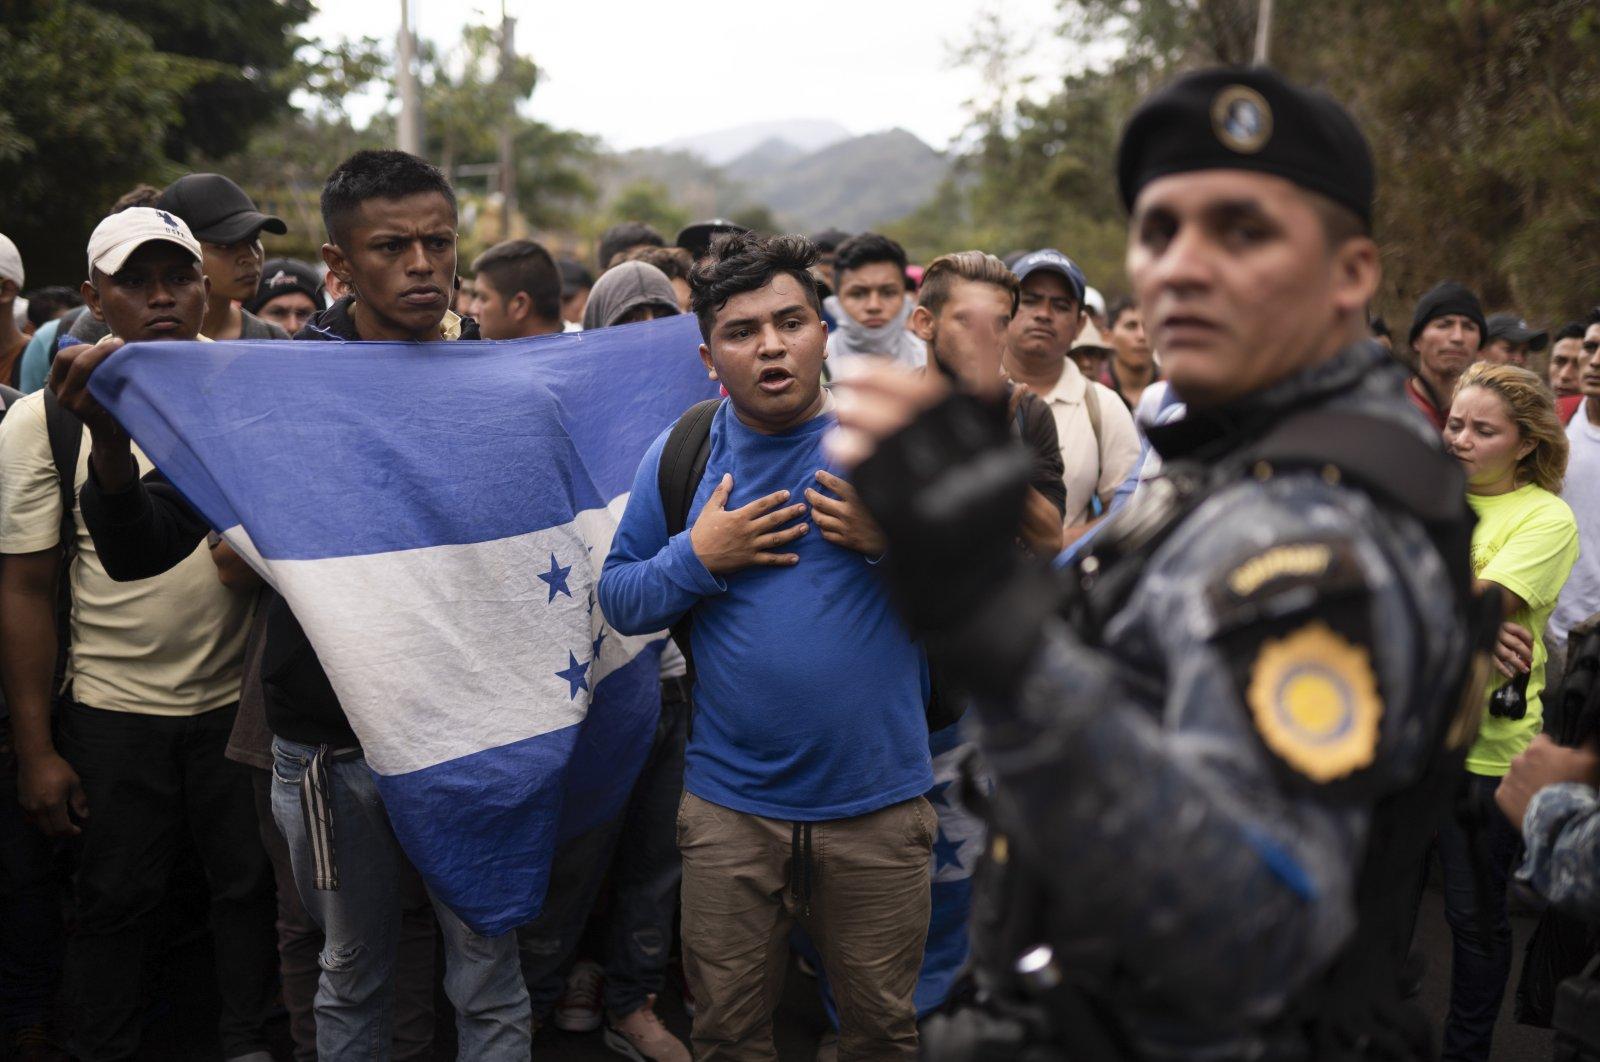 Honduran migrants hoping to reach the U.S. border are stopped at the Honduras border by Guatemalan police near Agua Caliente, Guatemala, Jan. 16, 2020. (AP Photo)